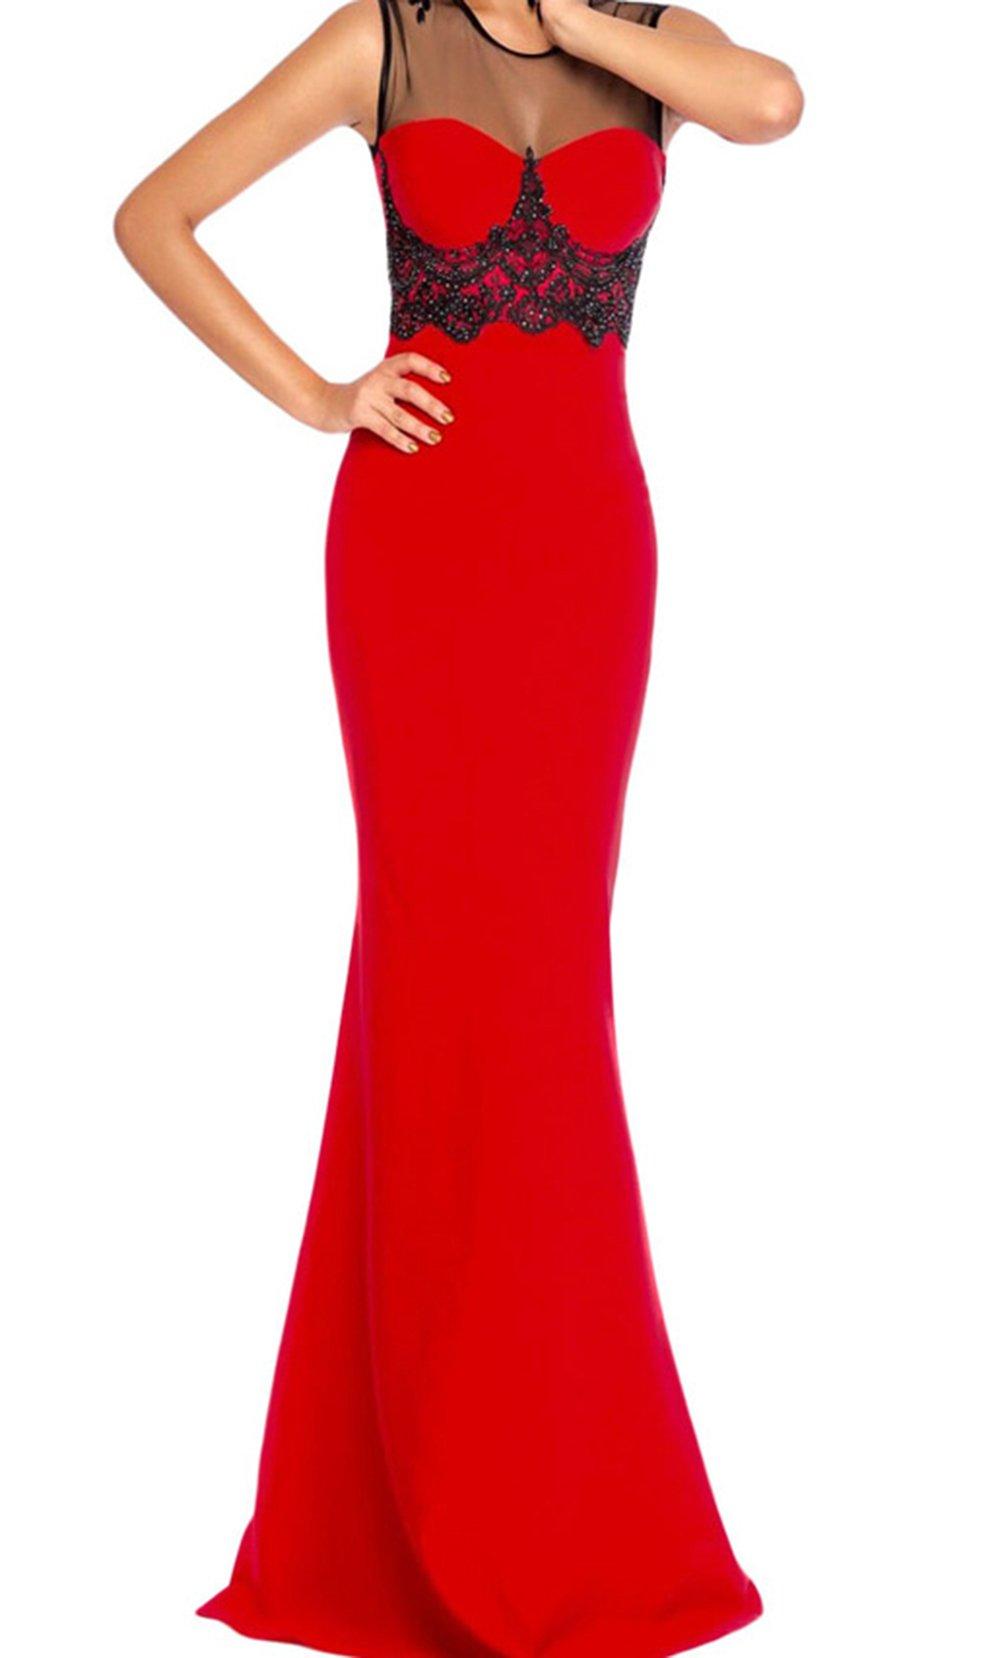 YeeATZ Mesh Splice Beaded Red Evening Dress(Red,M) by YeeATZ